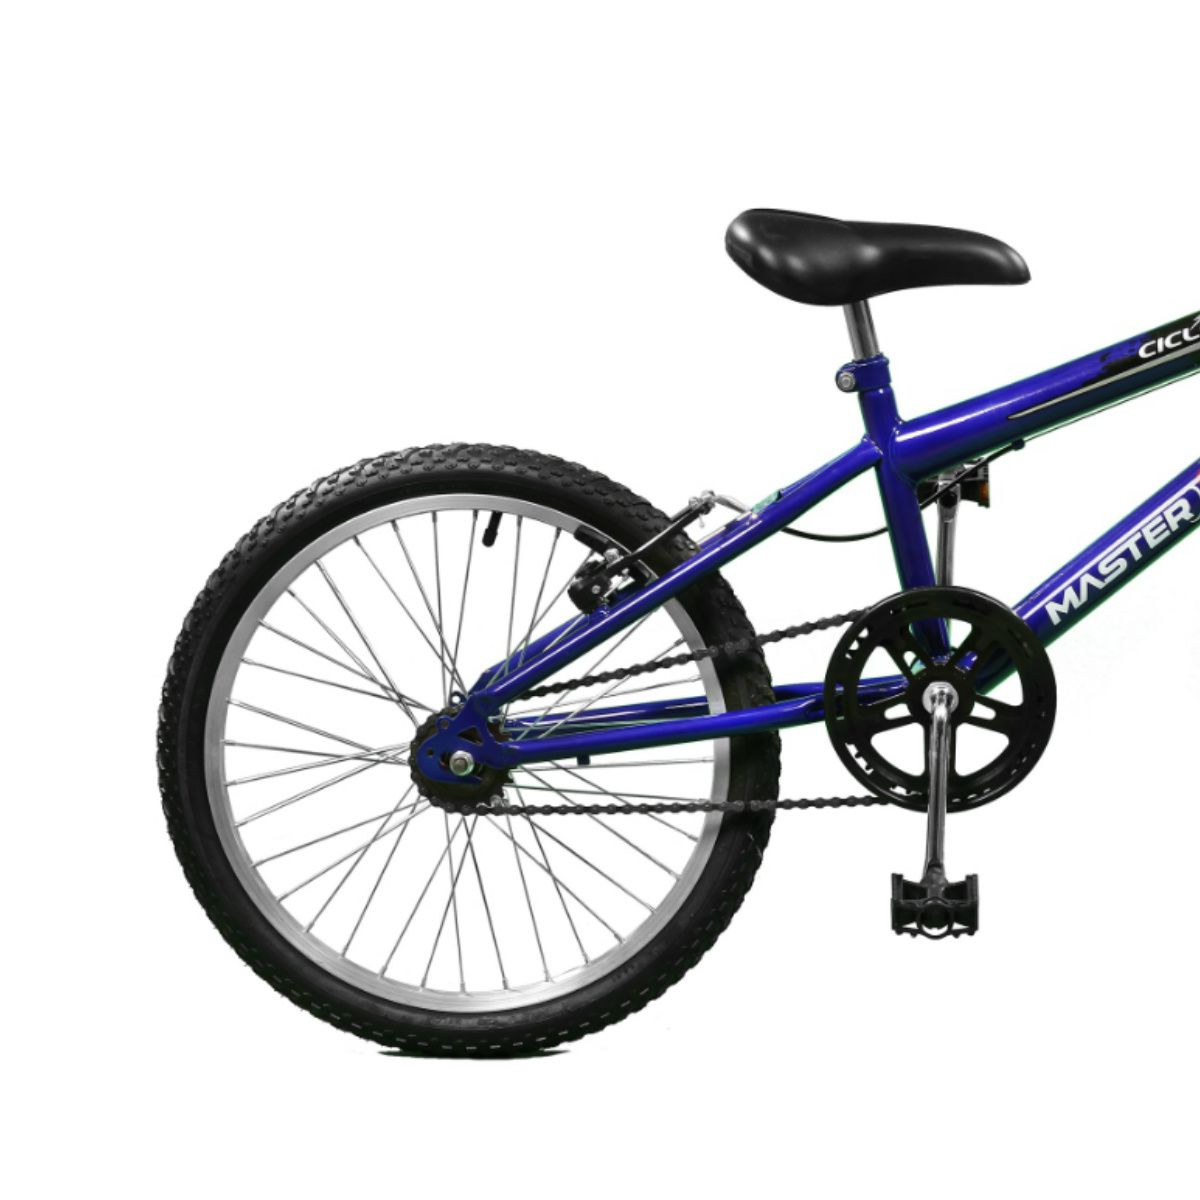 Bicicleta Master Bike Aro 20 Ciclone Freio V-Brake Azul/Preto